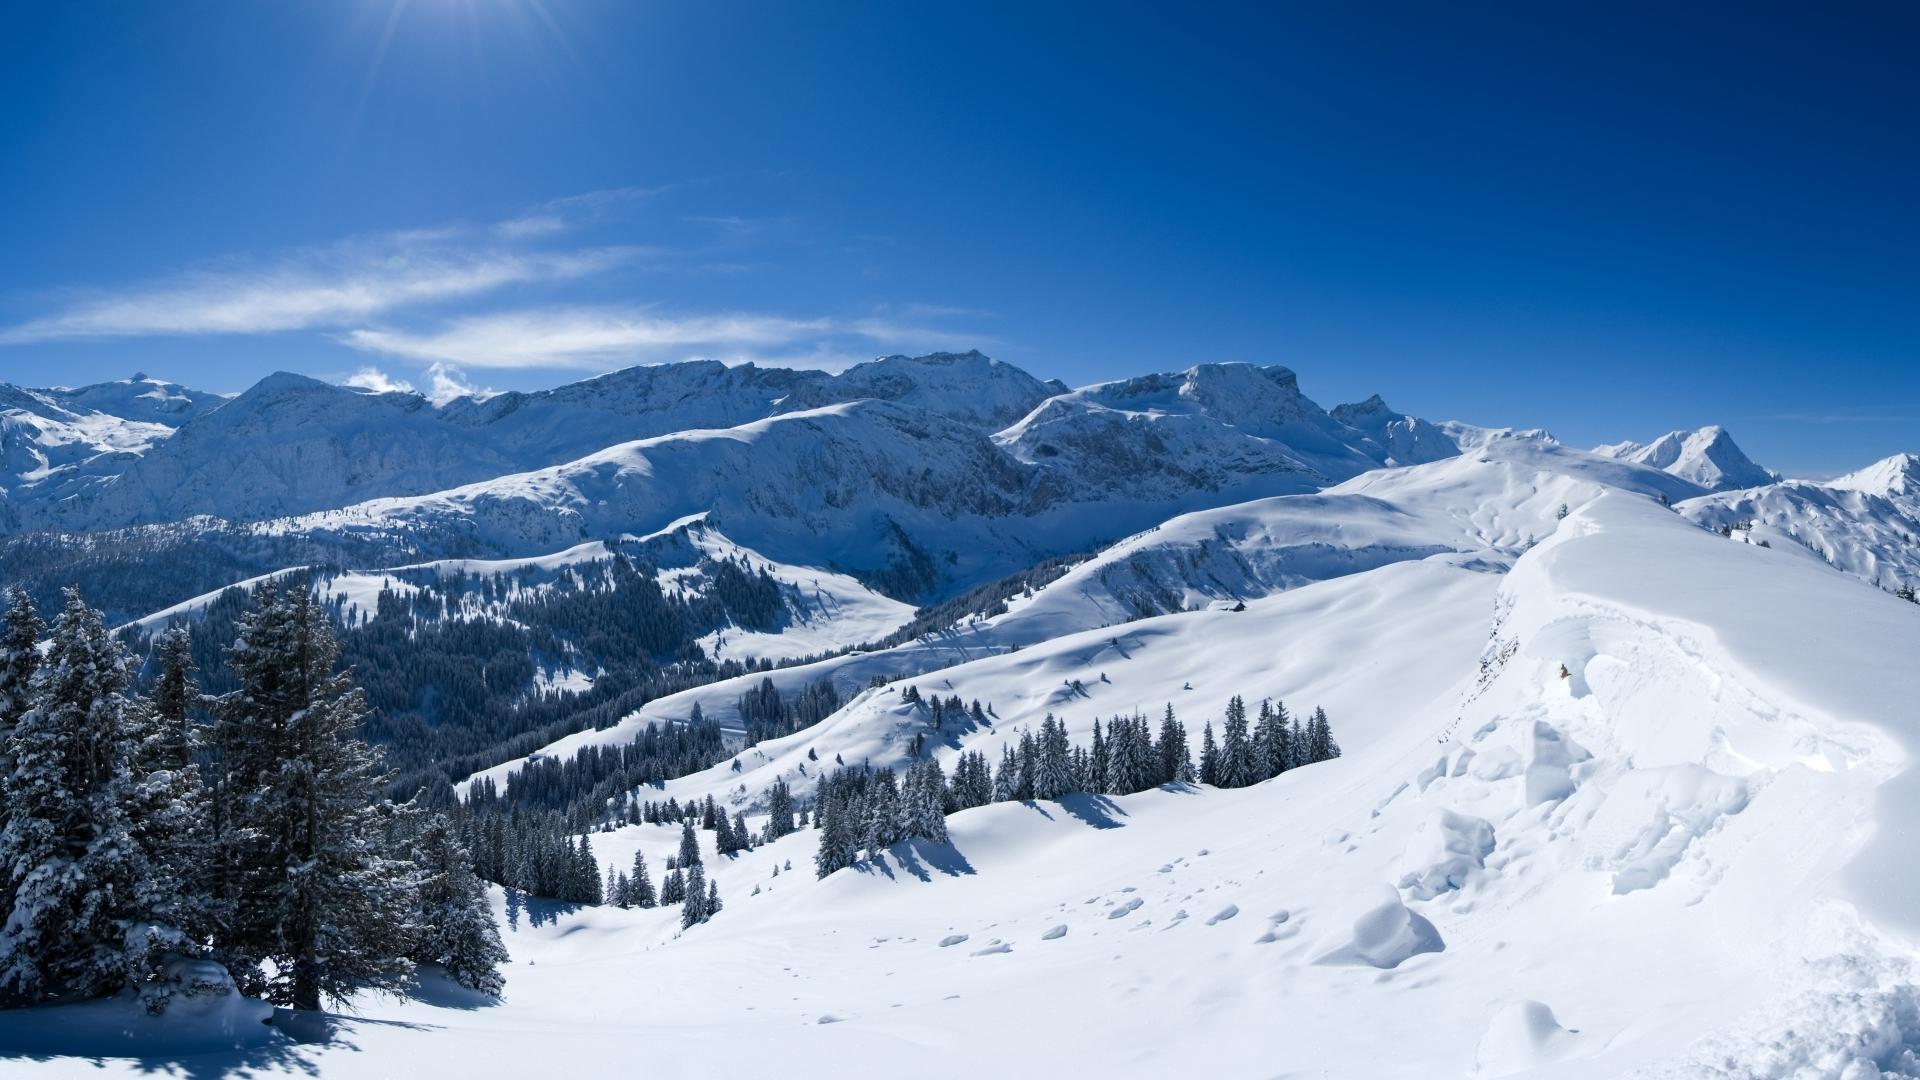 Snowy-Mountains-Scenery-Wallpaper-1.jpeg